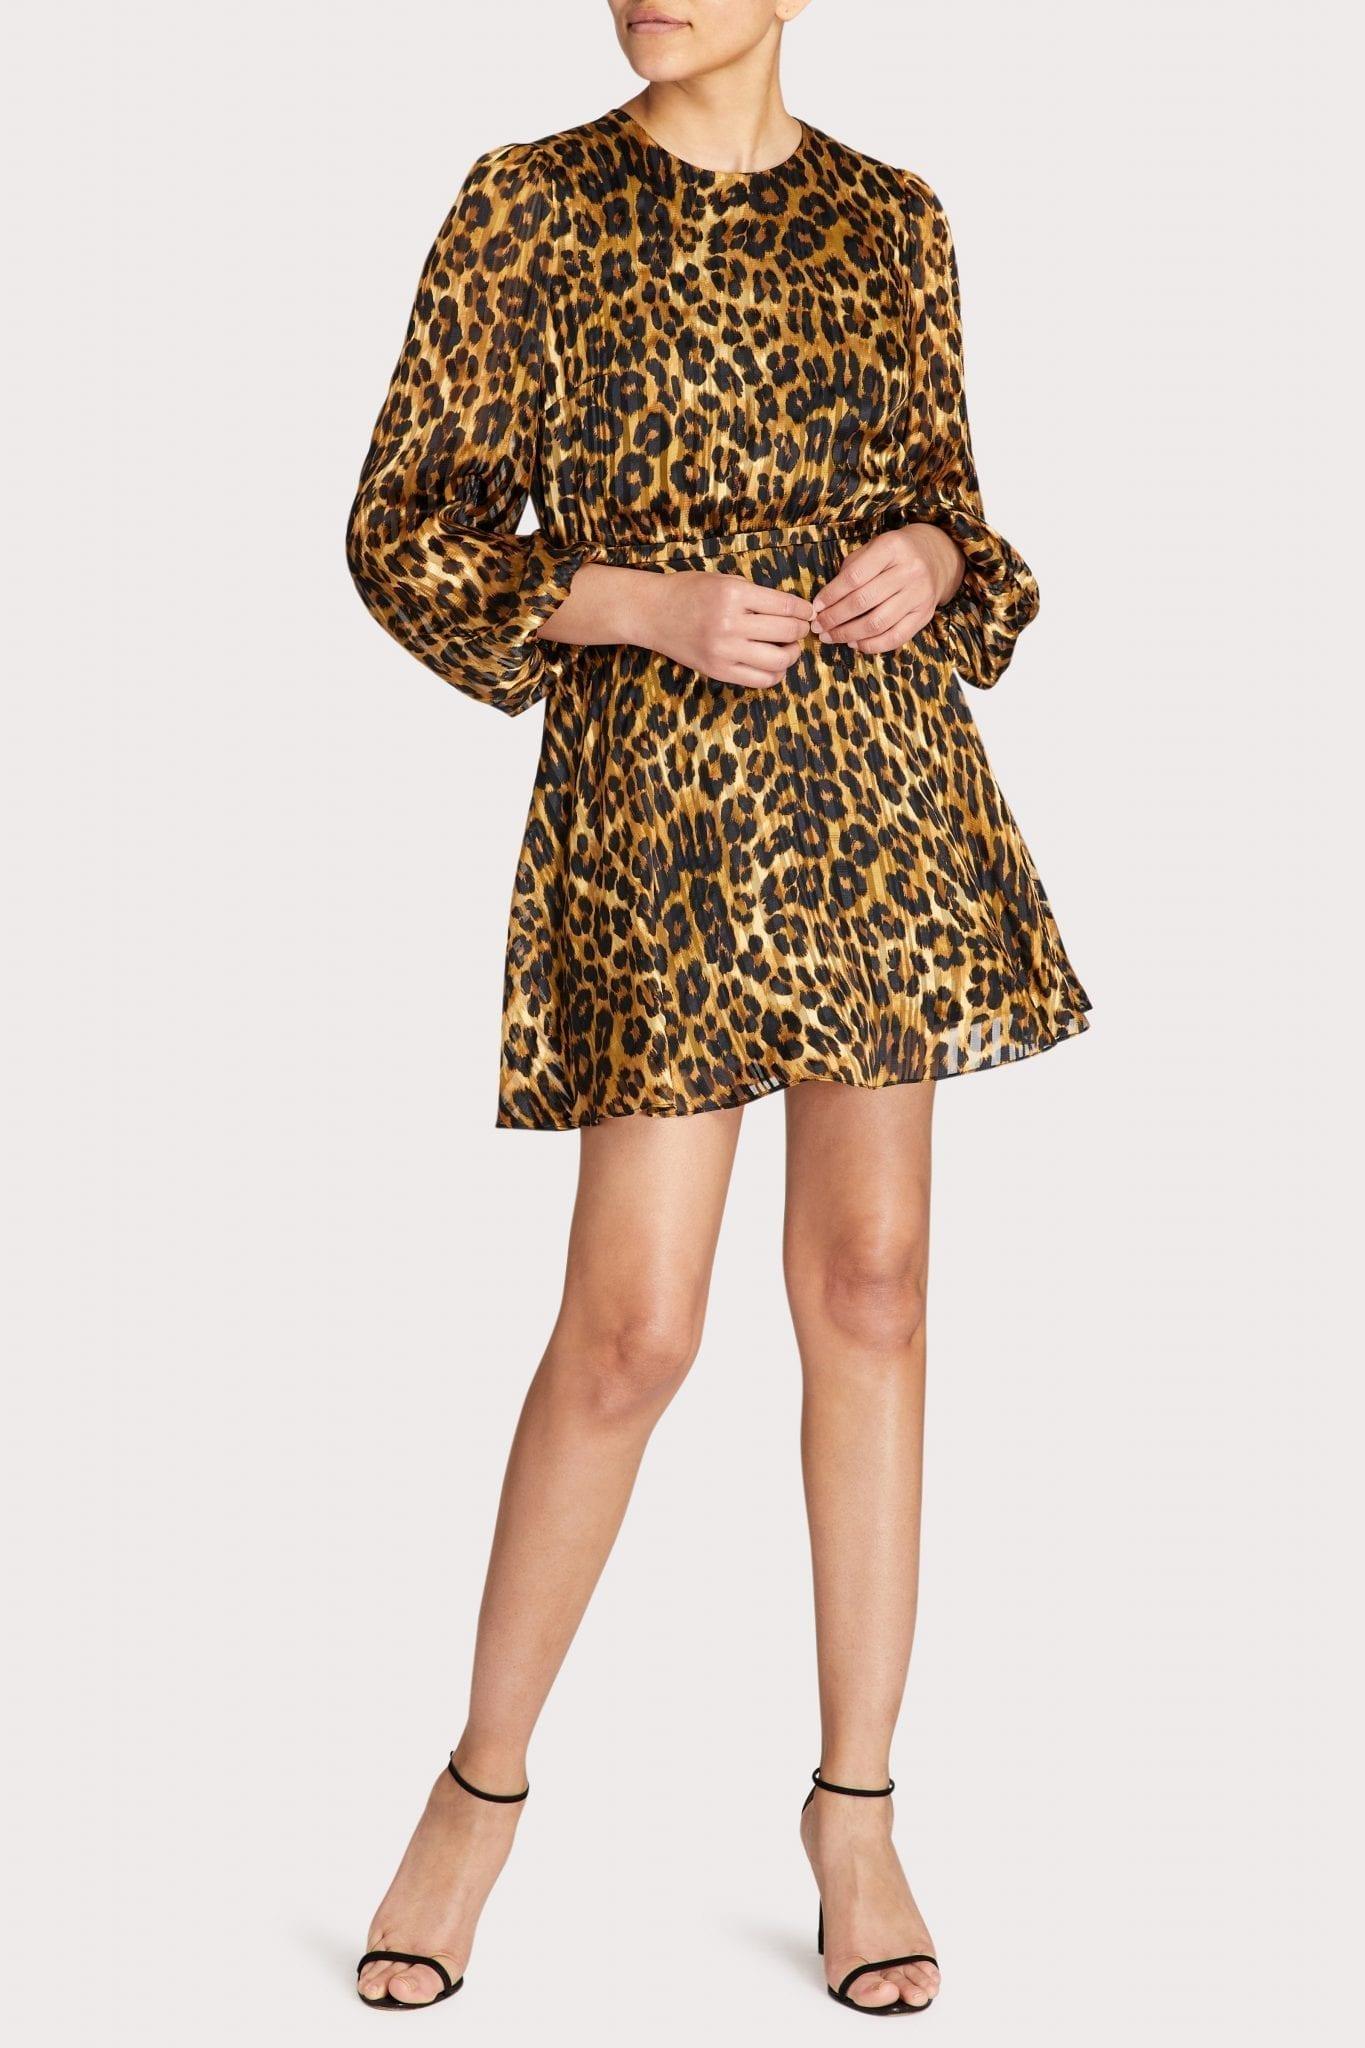 MILLY Elma Cheetah Burnout Dress